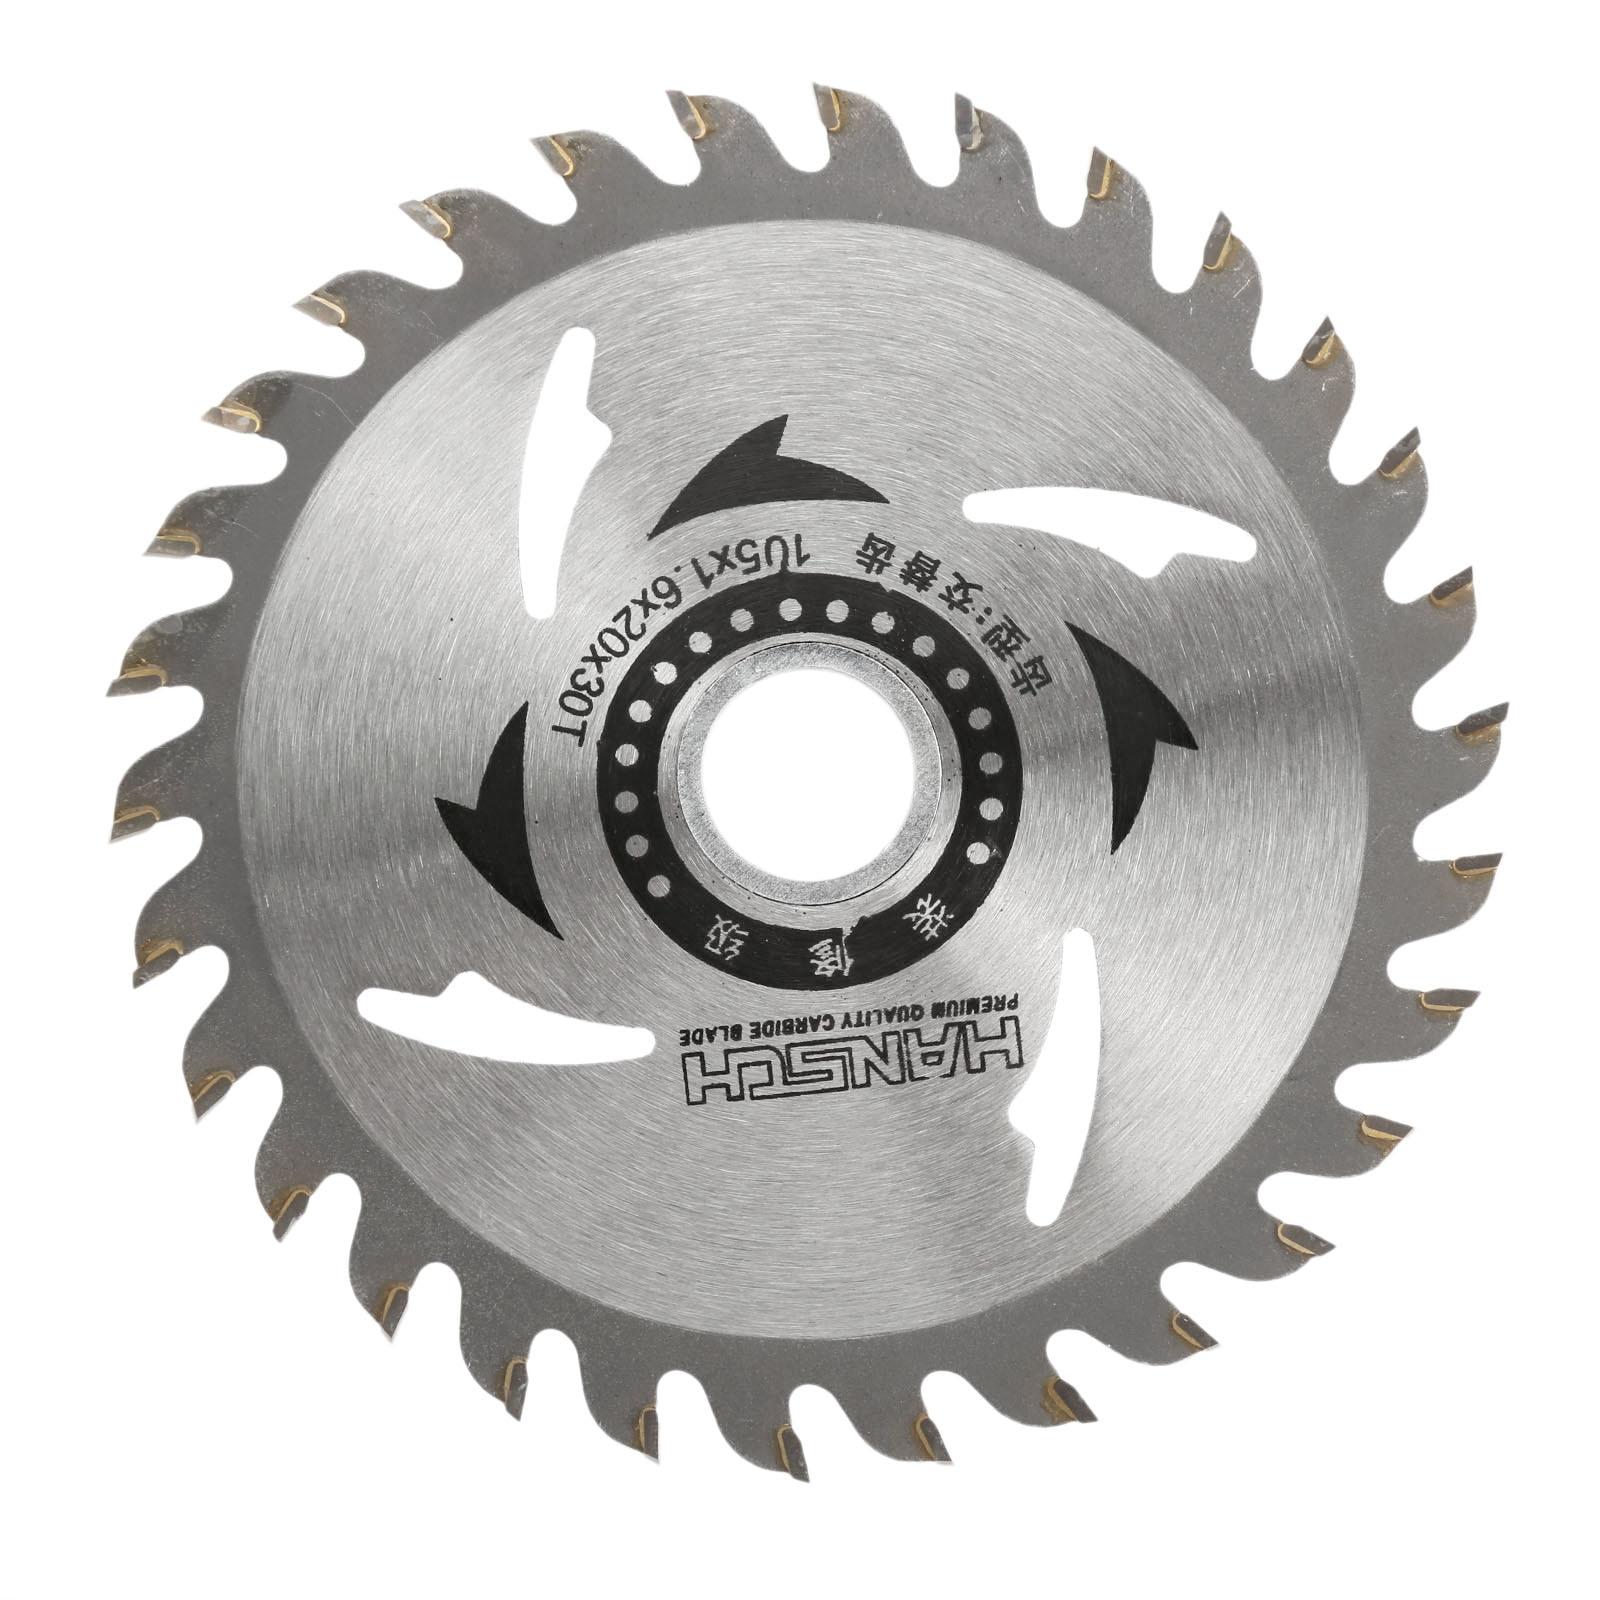 цена на 1Pc 30 Teeth Circular Saw Blade Wheel Cutting Discs Tungsten Steel Circular Wood Blade for Granite Power Tool Dremel Accesories